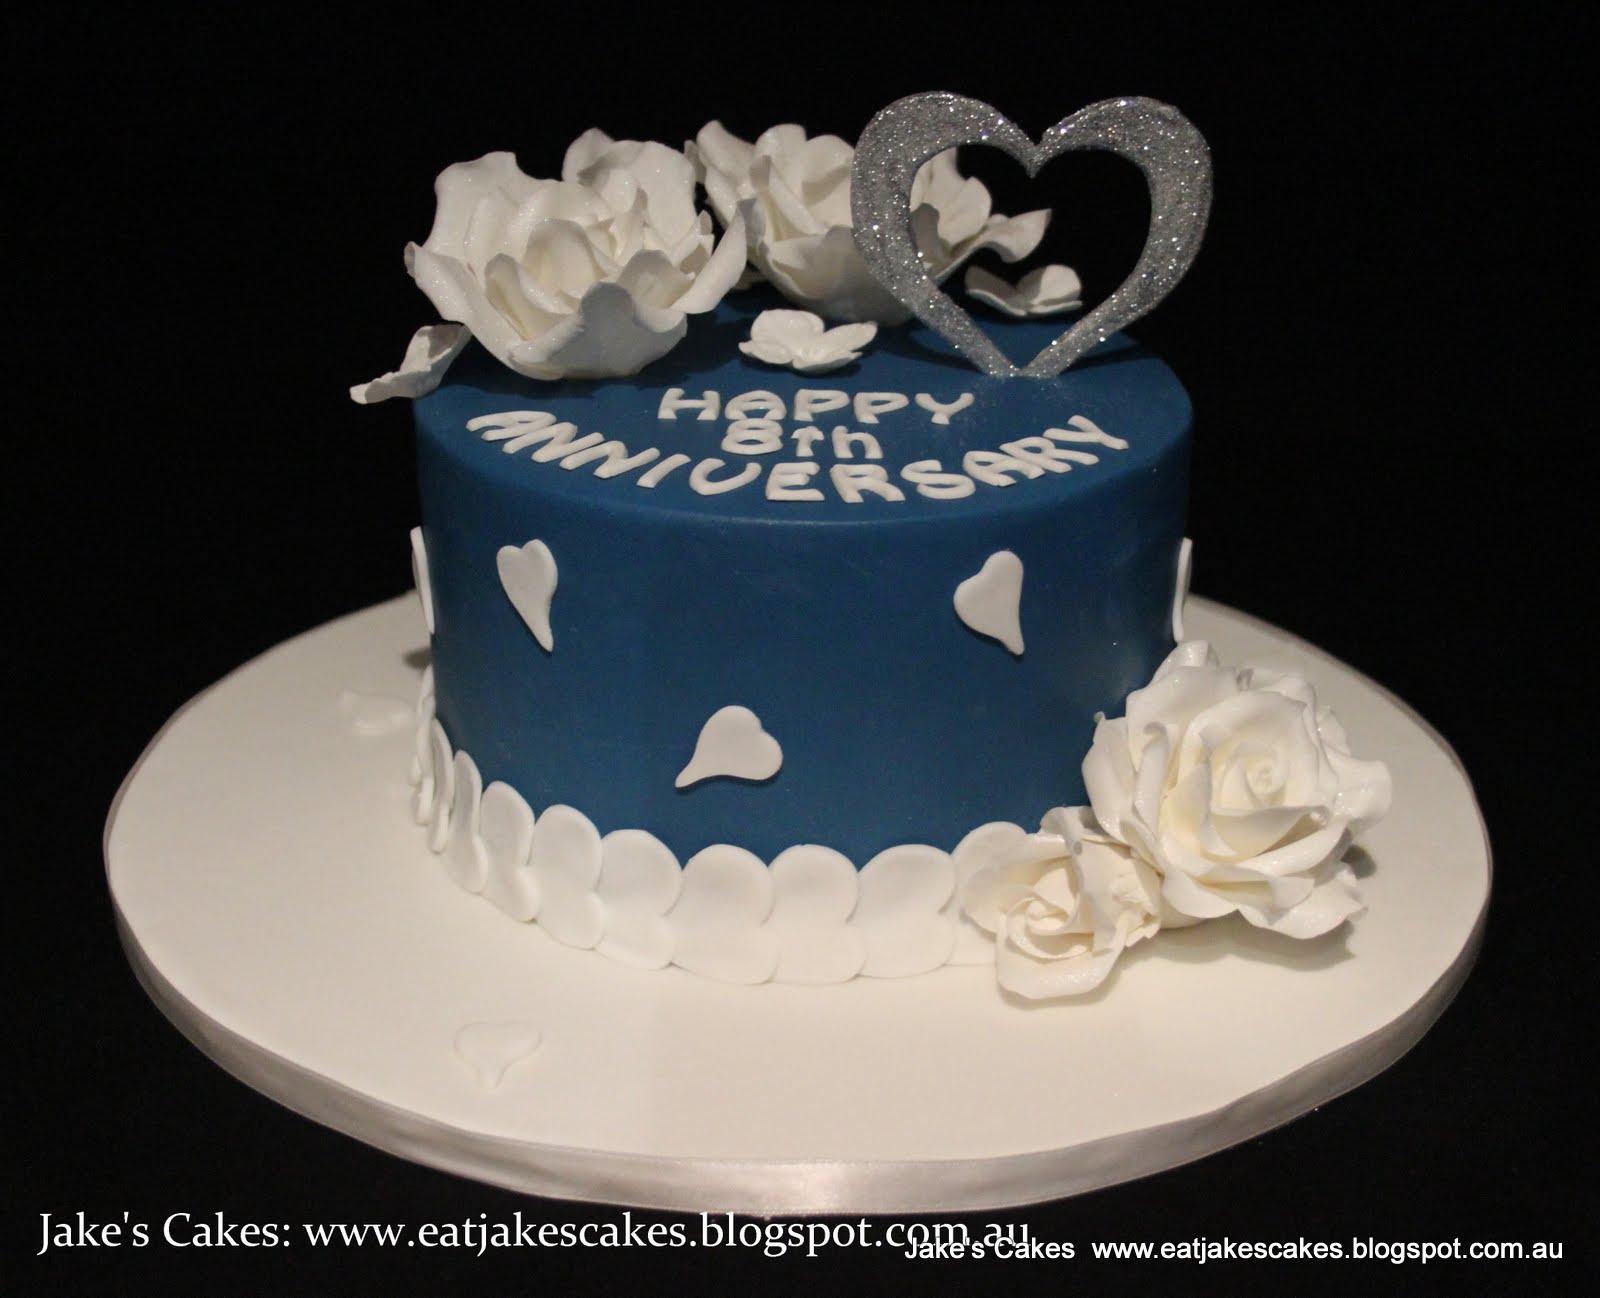 Jakes Cakes November 2012